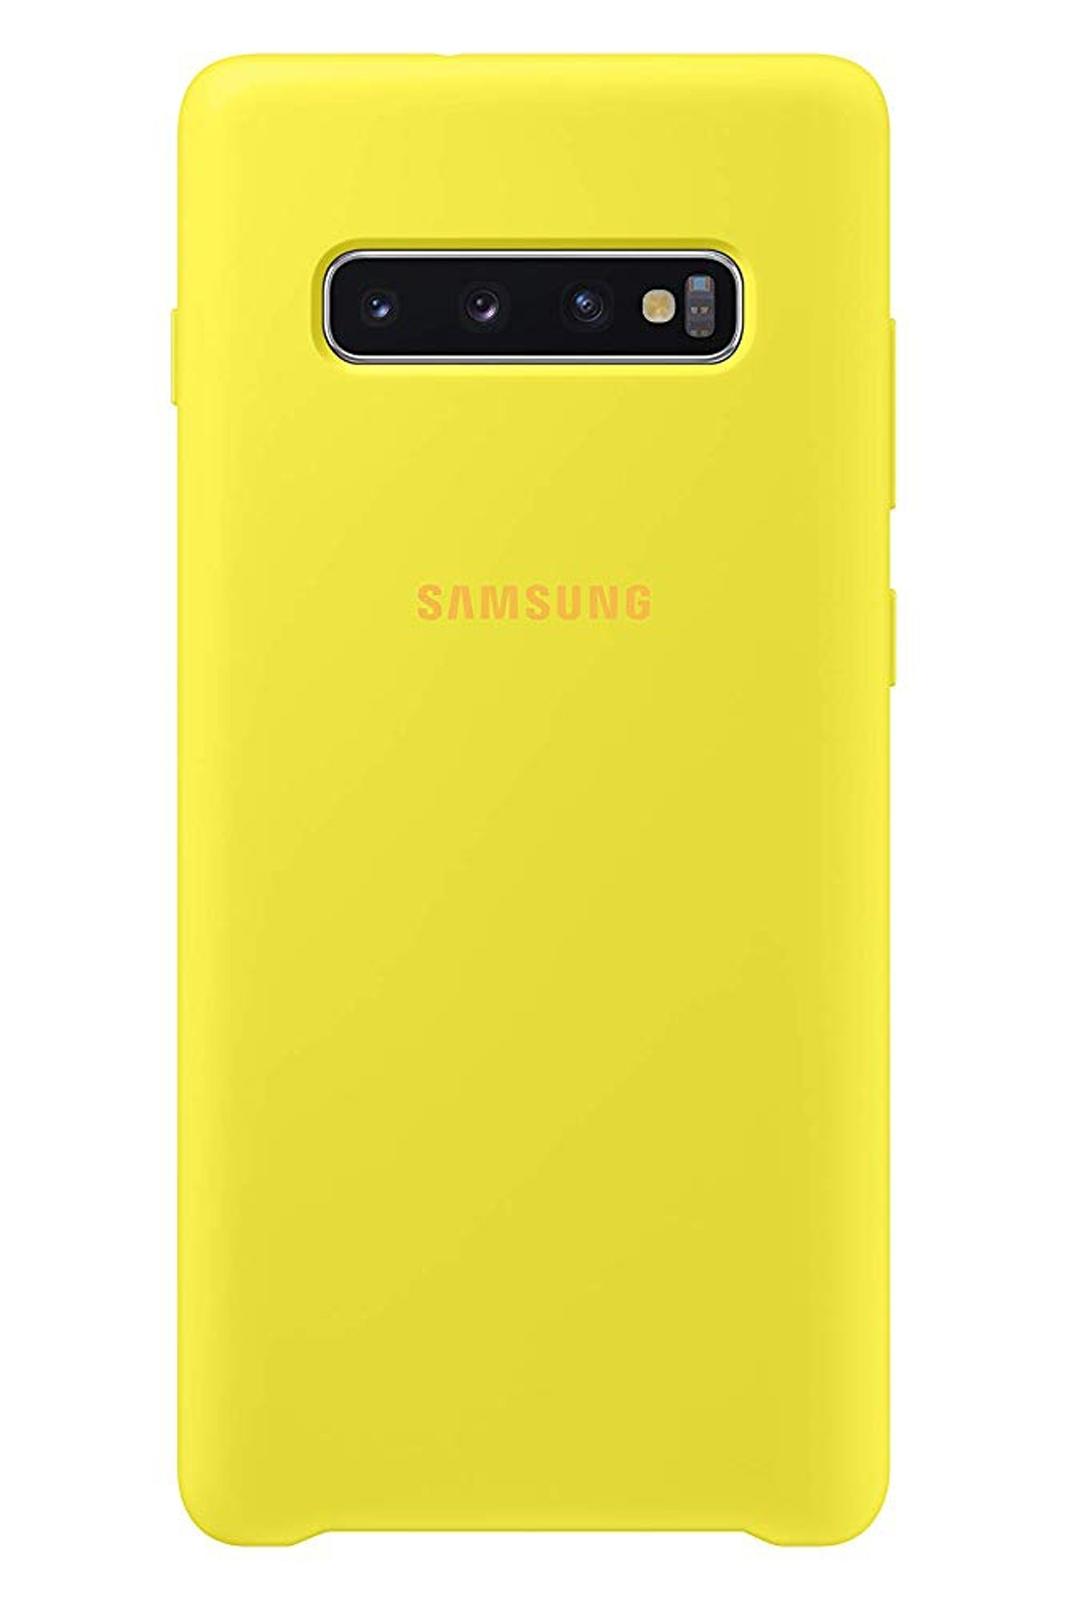 samsung s10 plus cover case